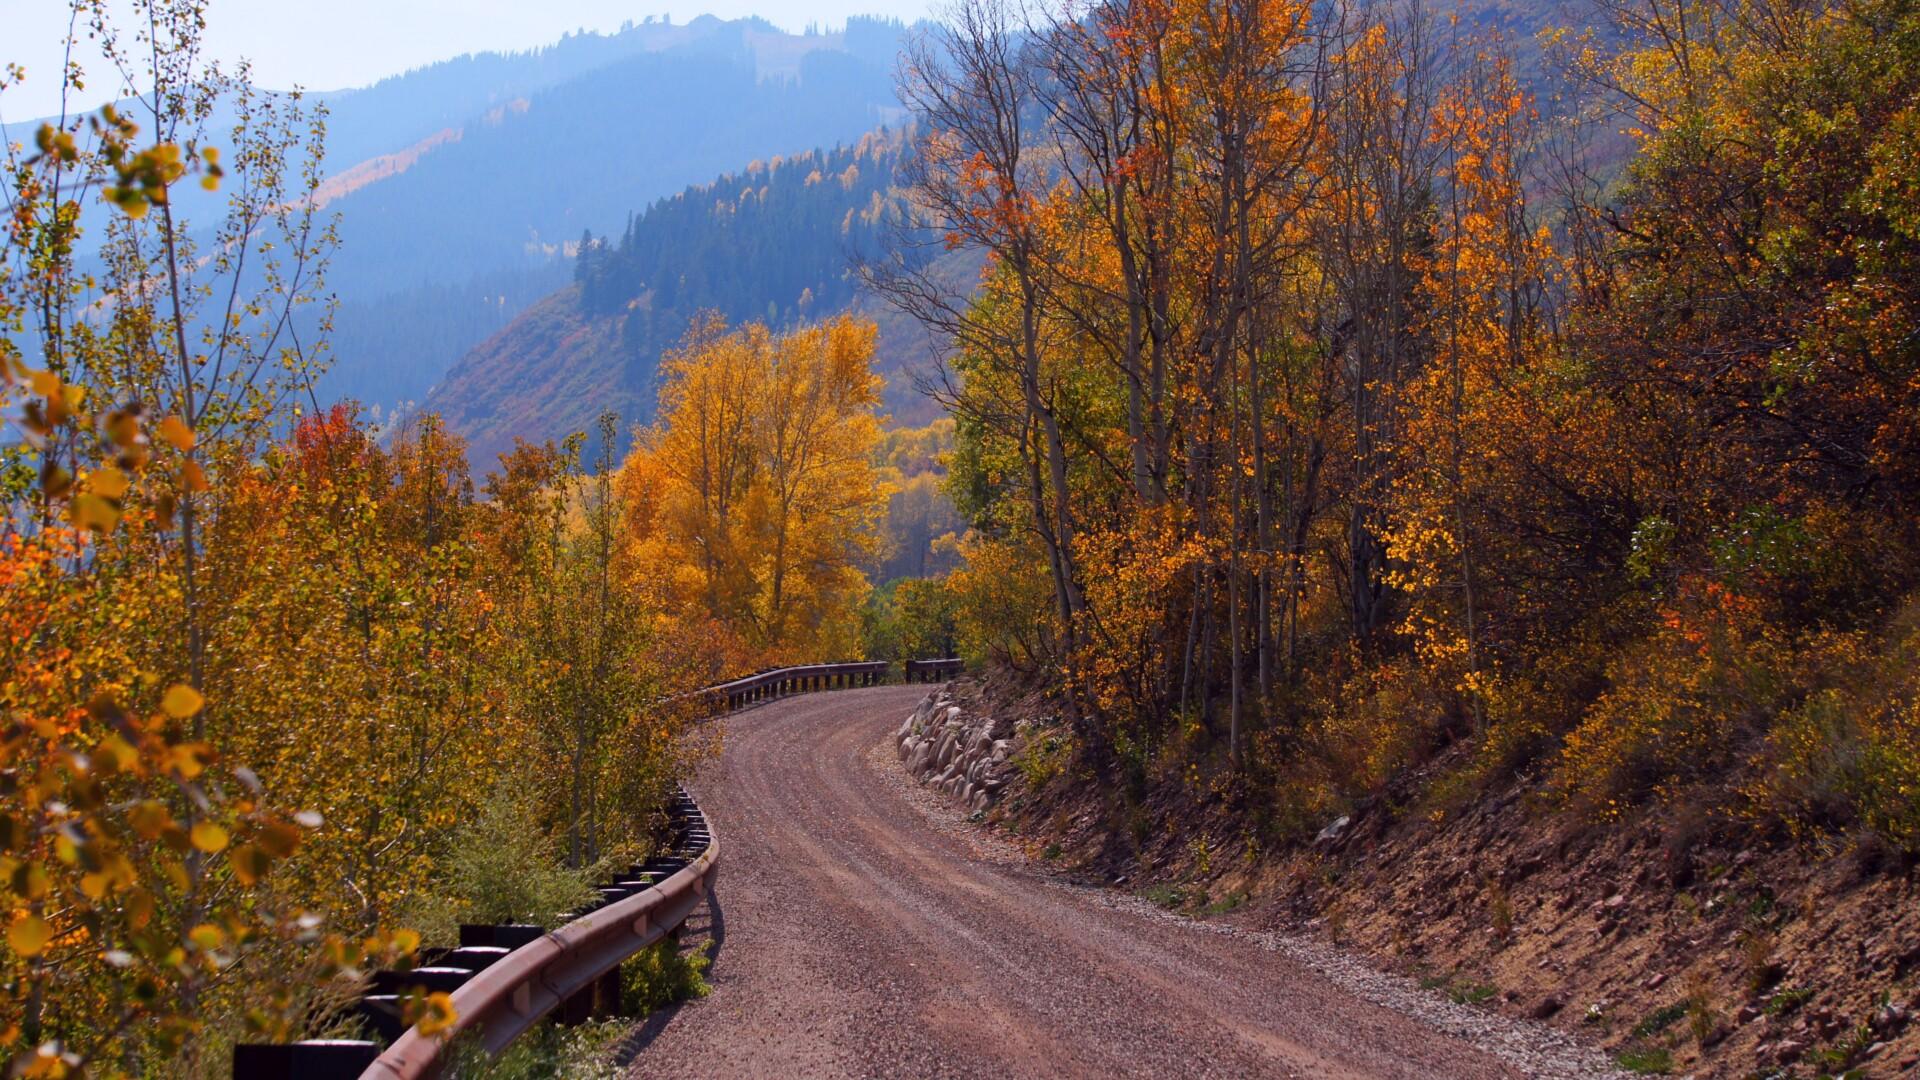 Aspen Country Road Shawn Rosvold.jpg